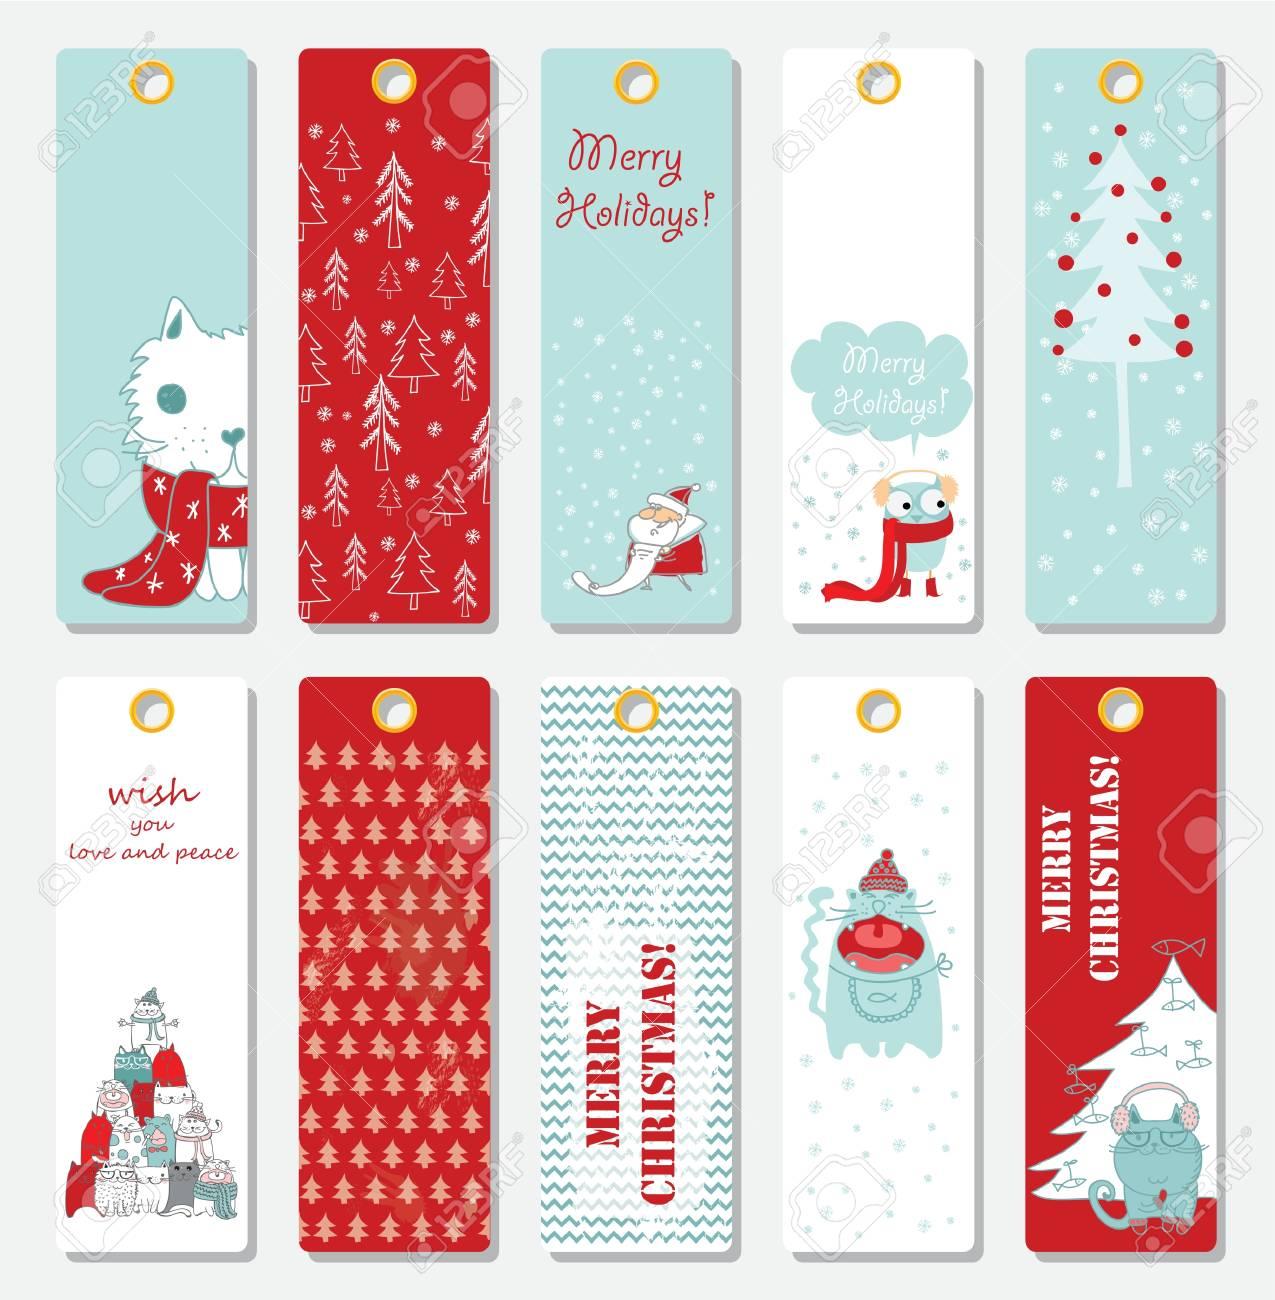 Christmas Tag Template.Collection Of 10 Christmas Tag Cards Templates